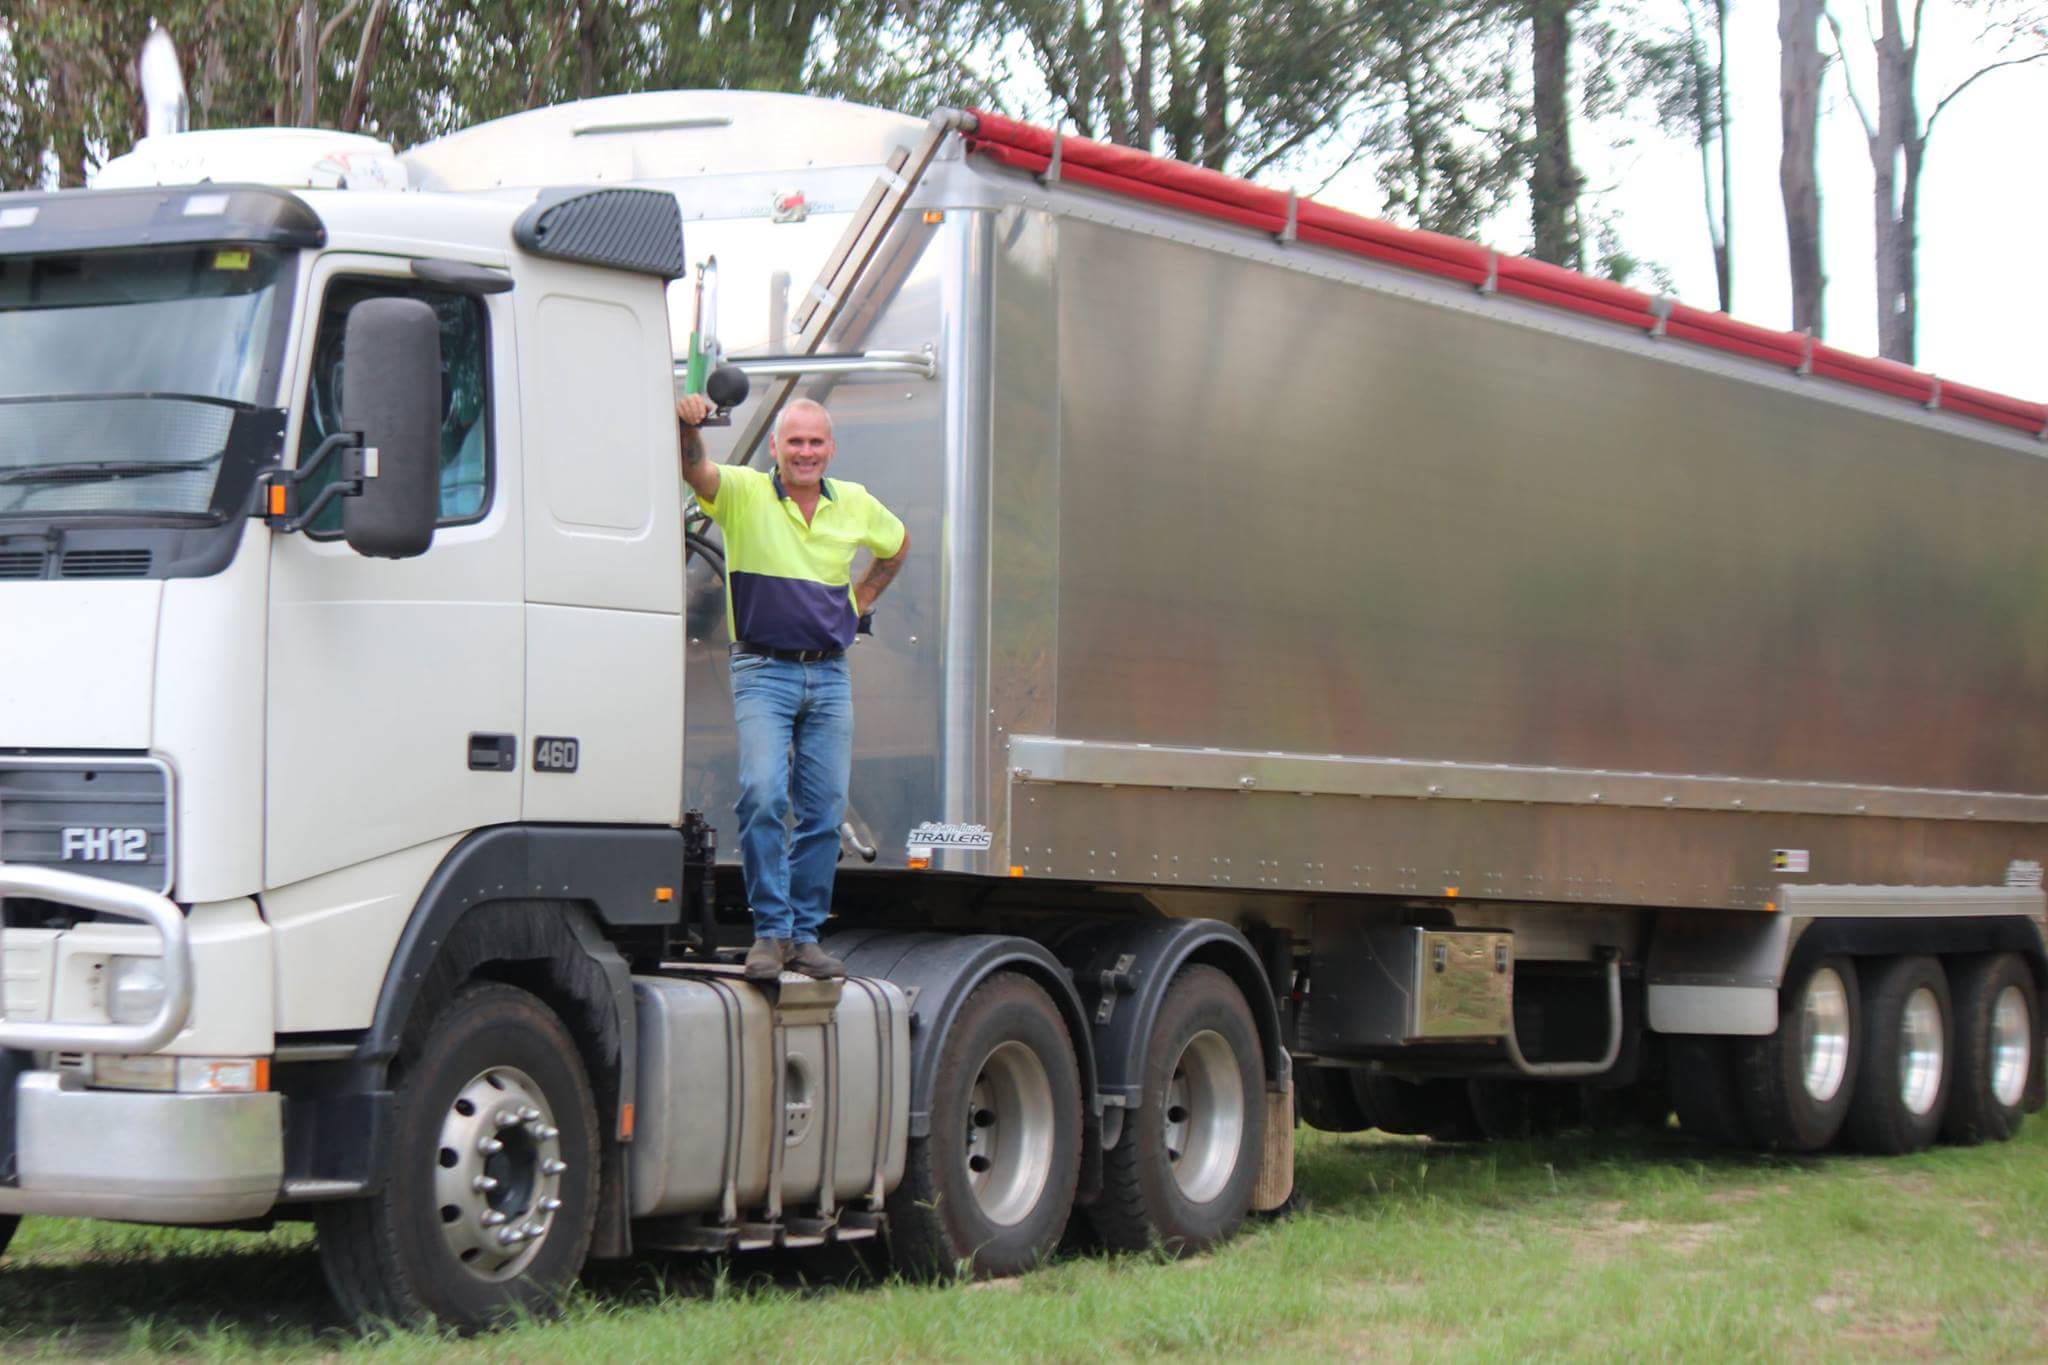 Merv-on-Truck-Fuel-Tank